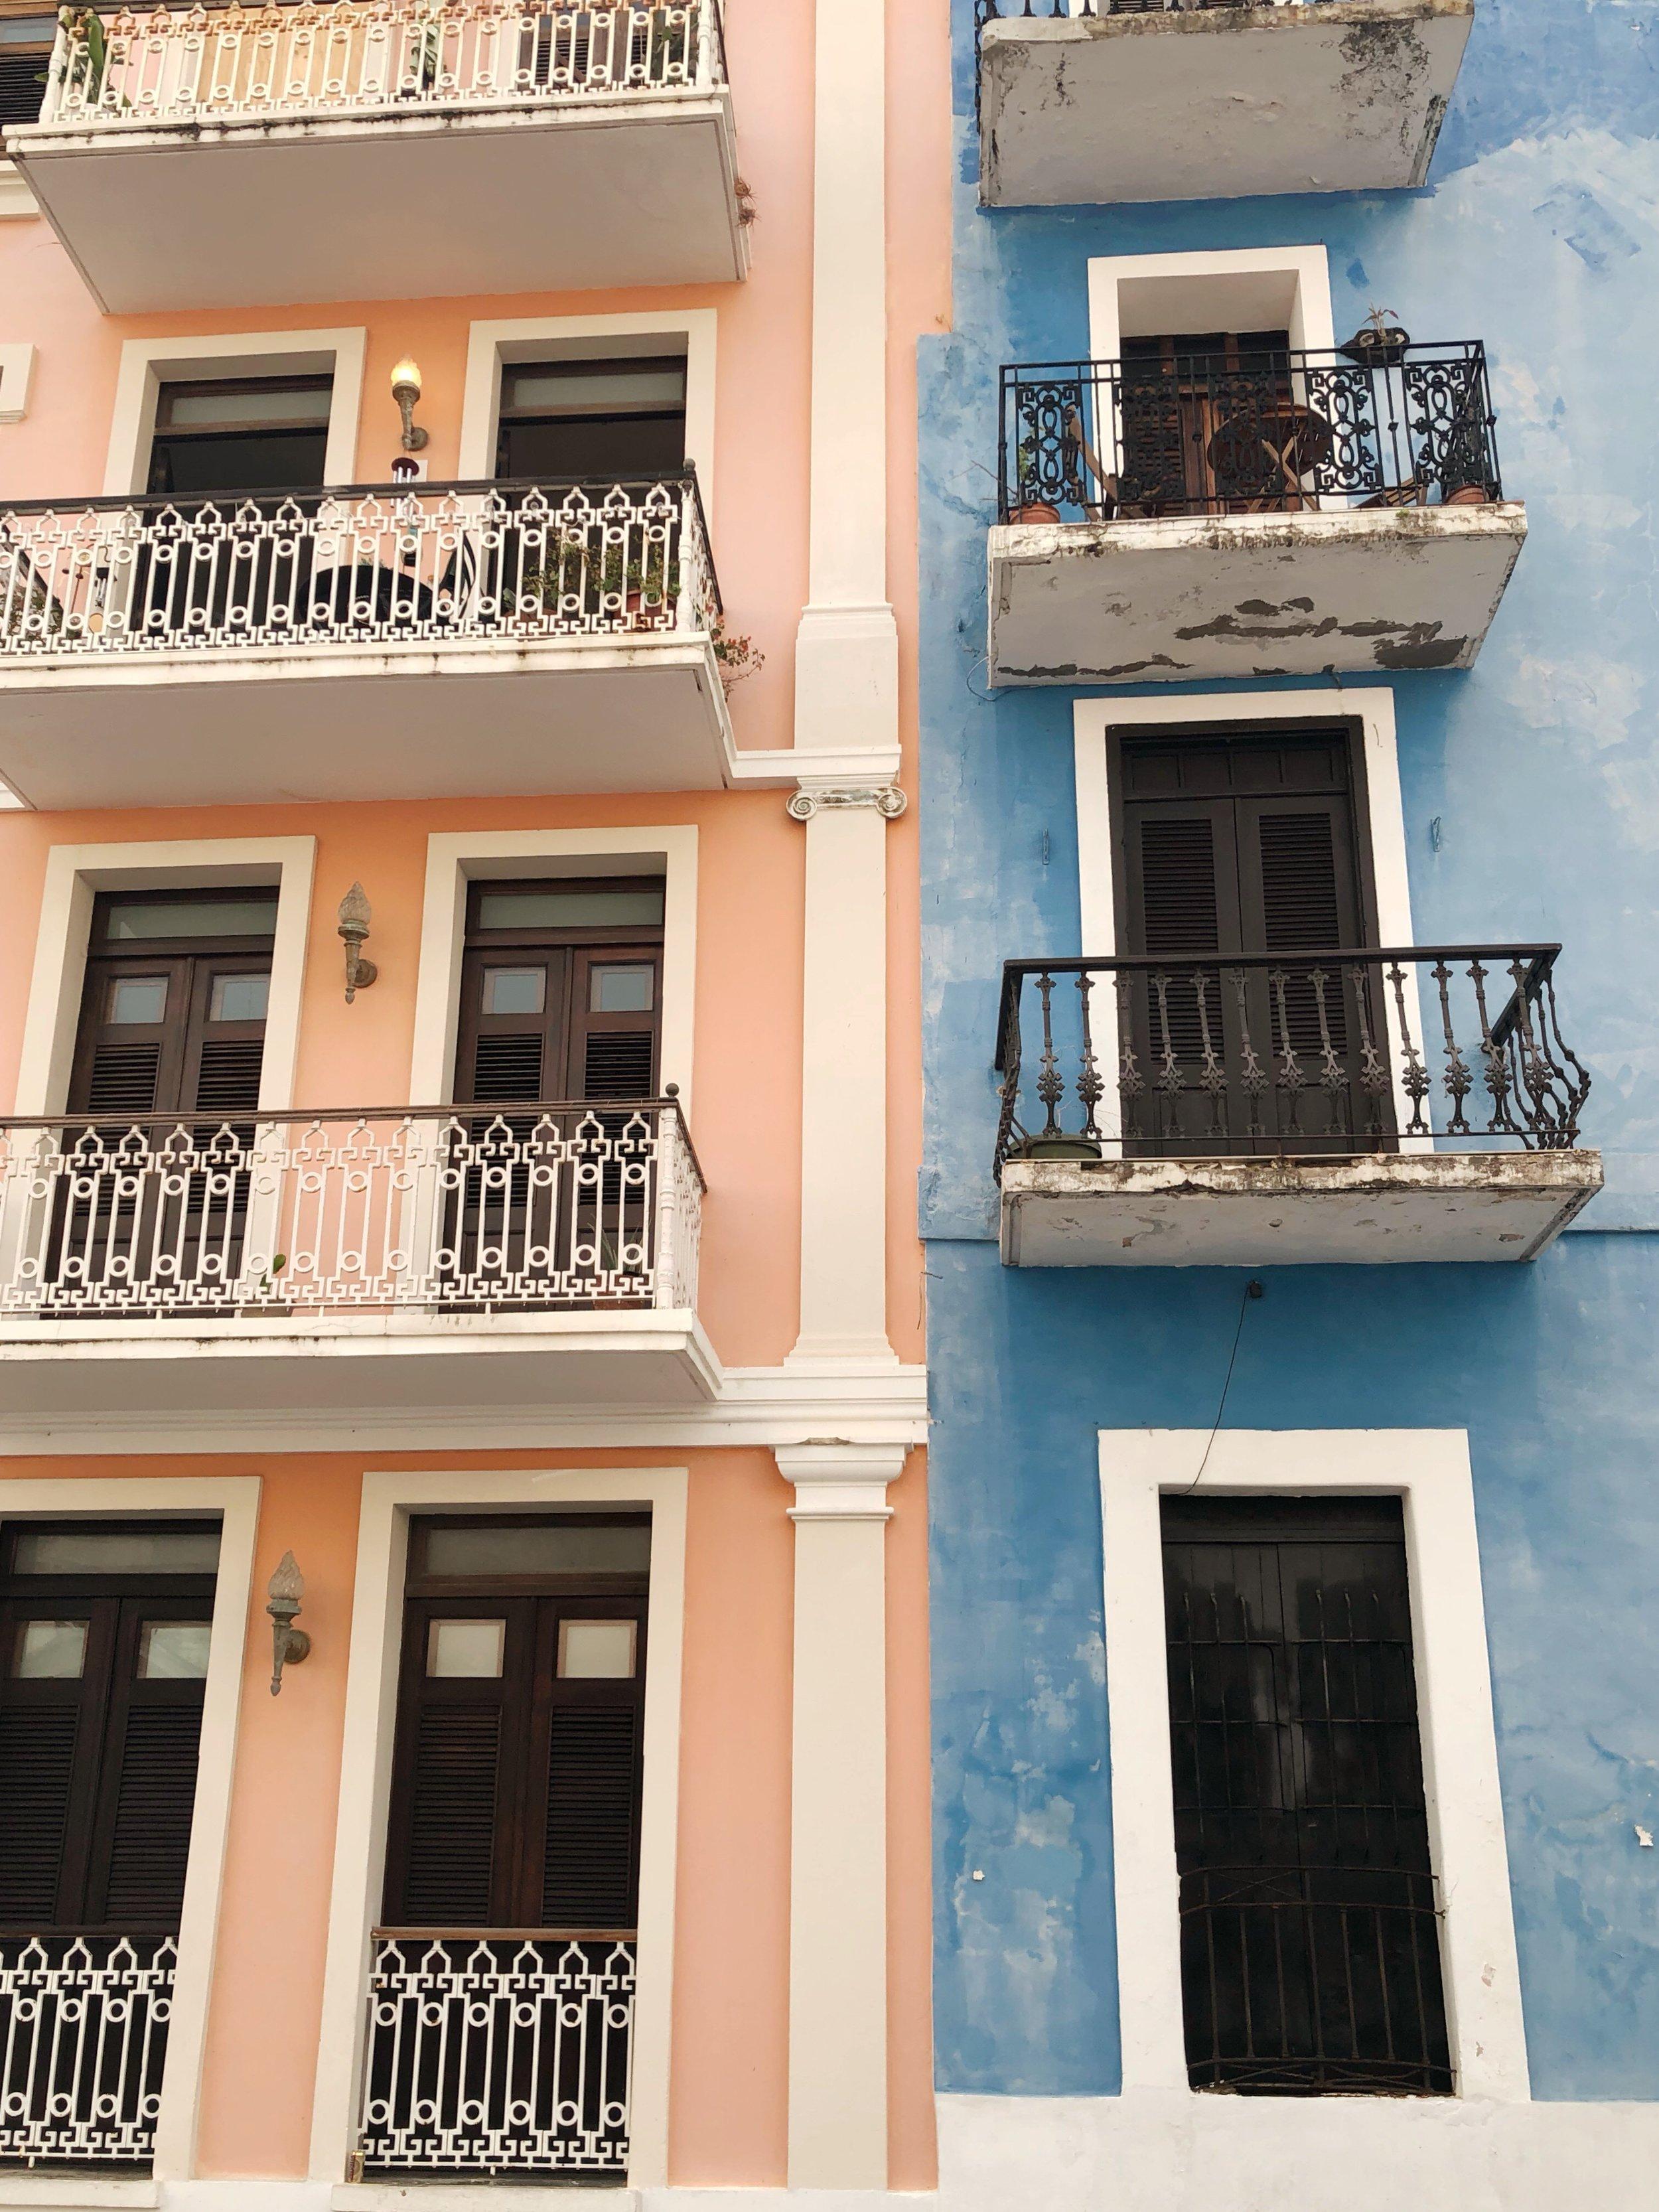 Admiring the buildings in Old San Juan.